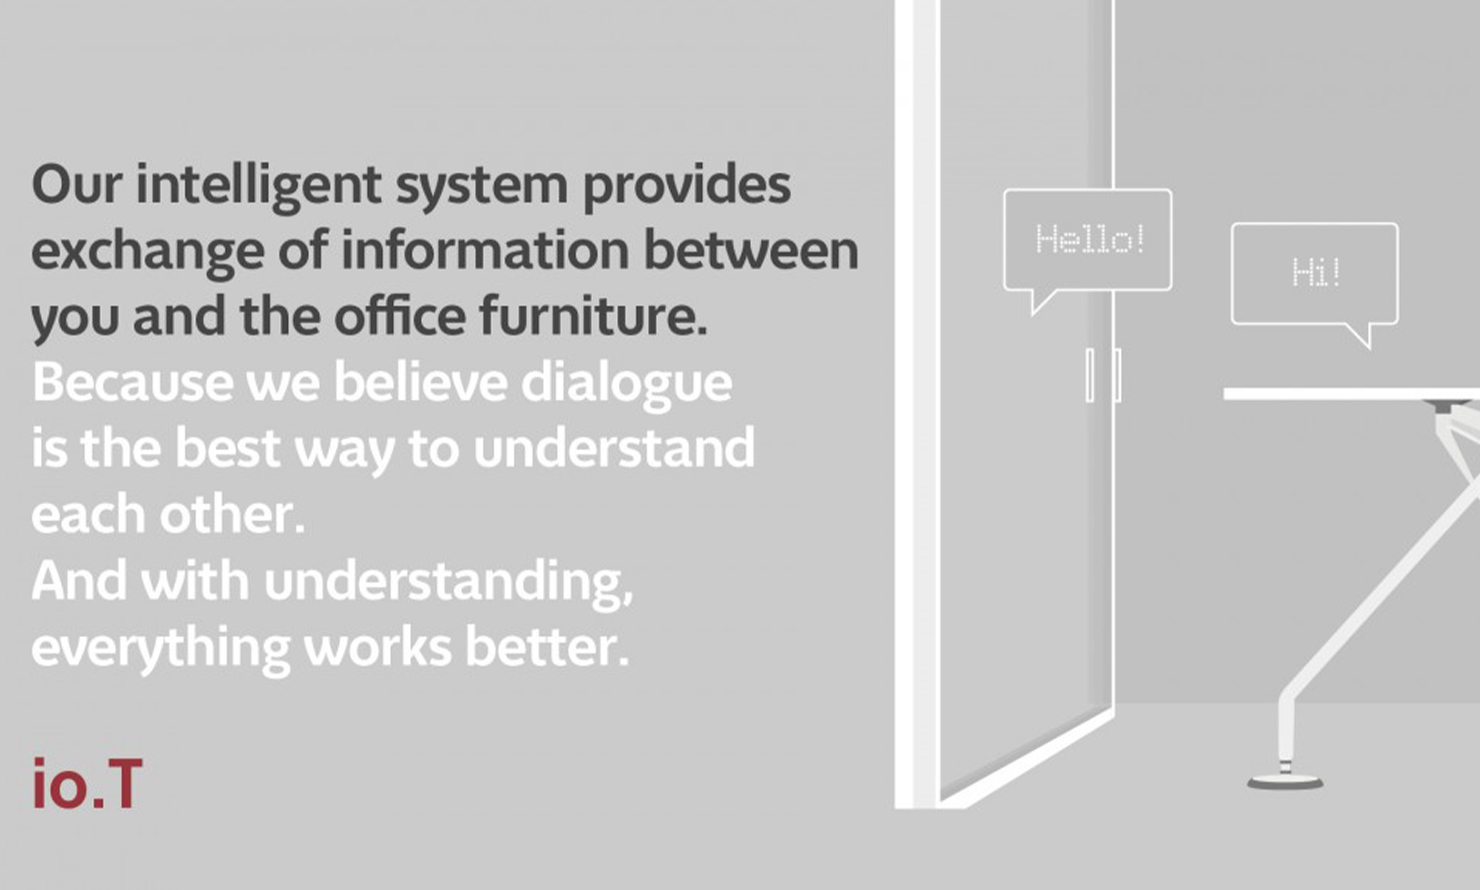 https://www.kubelibre.com/uploads/Slider-work-tutti-clienti/tecno-redesigning-the-future-of-the-future-of-work-14.jpg